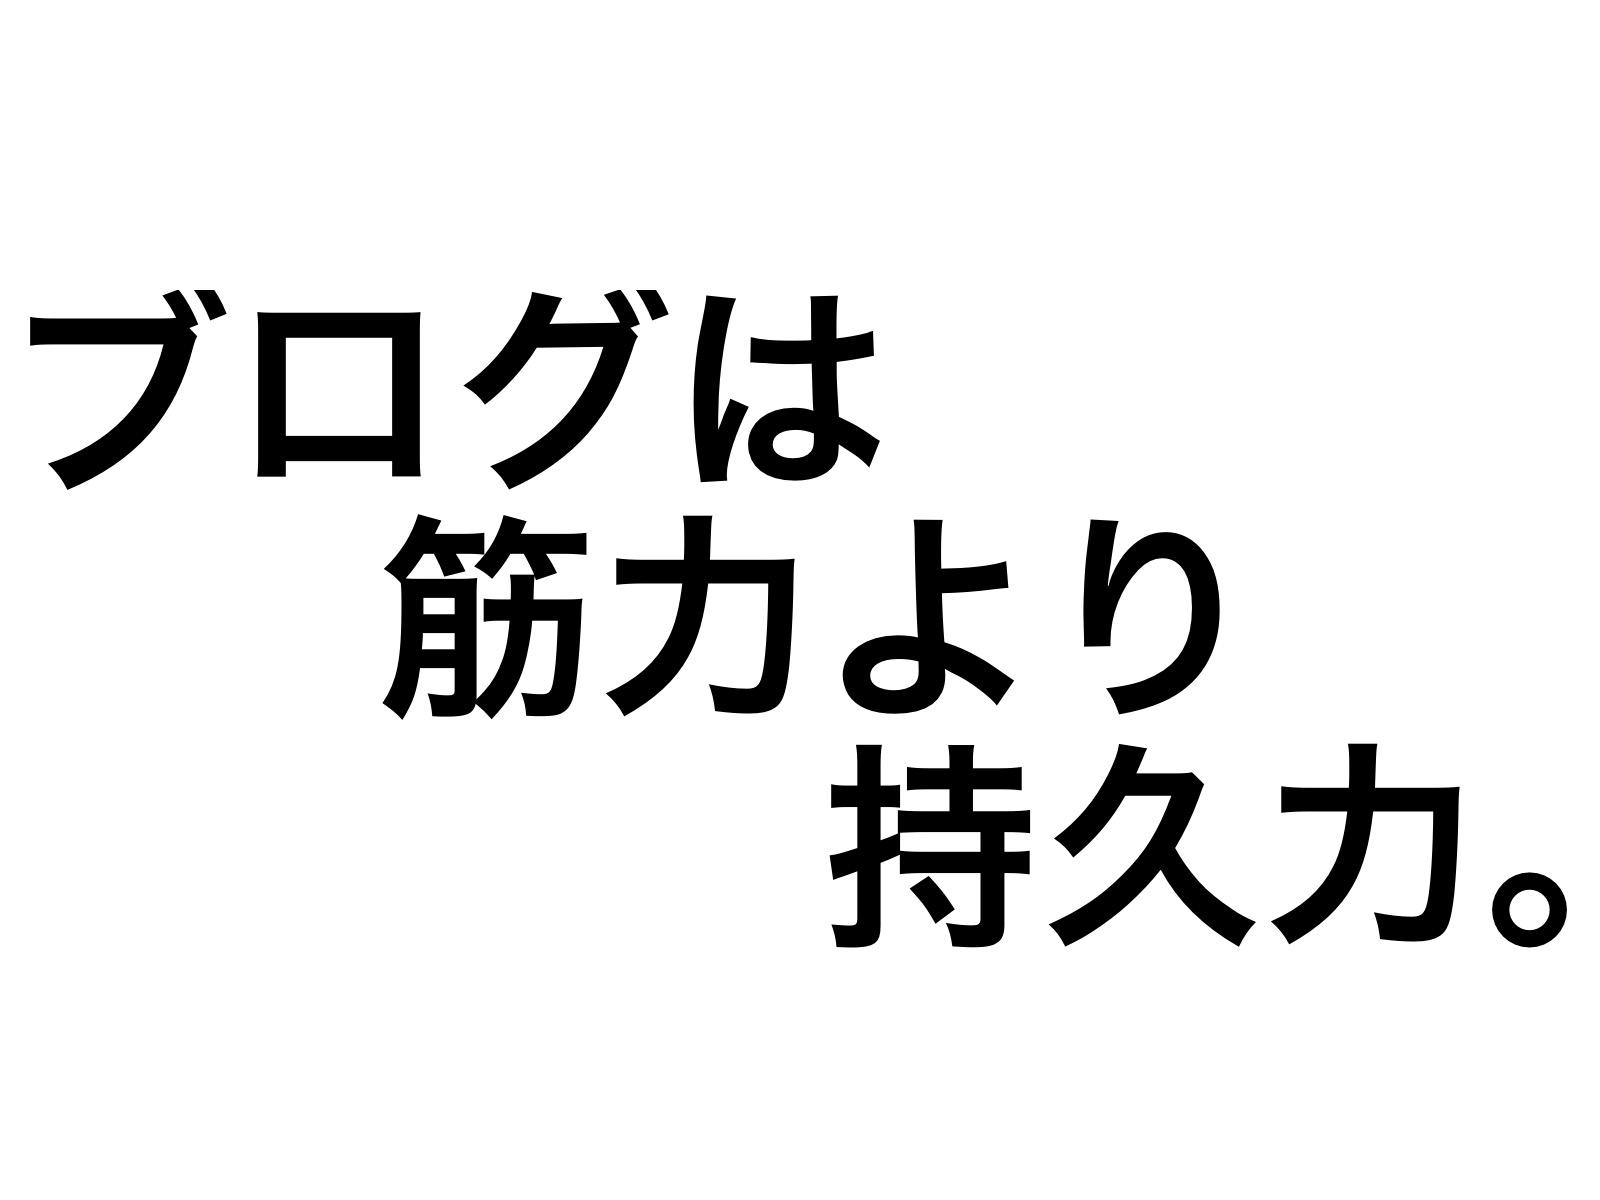 2016 10 22 20 09